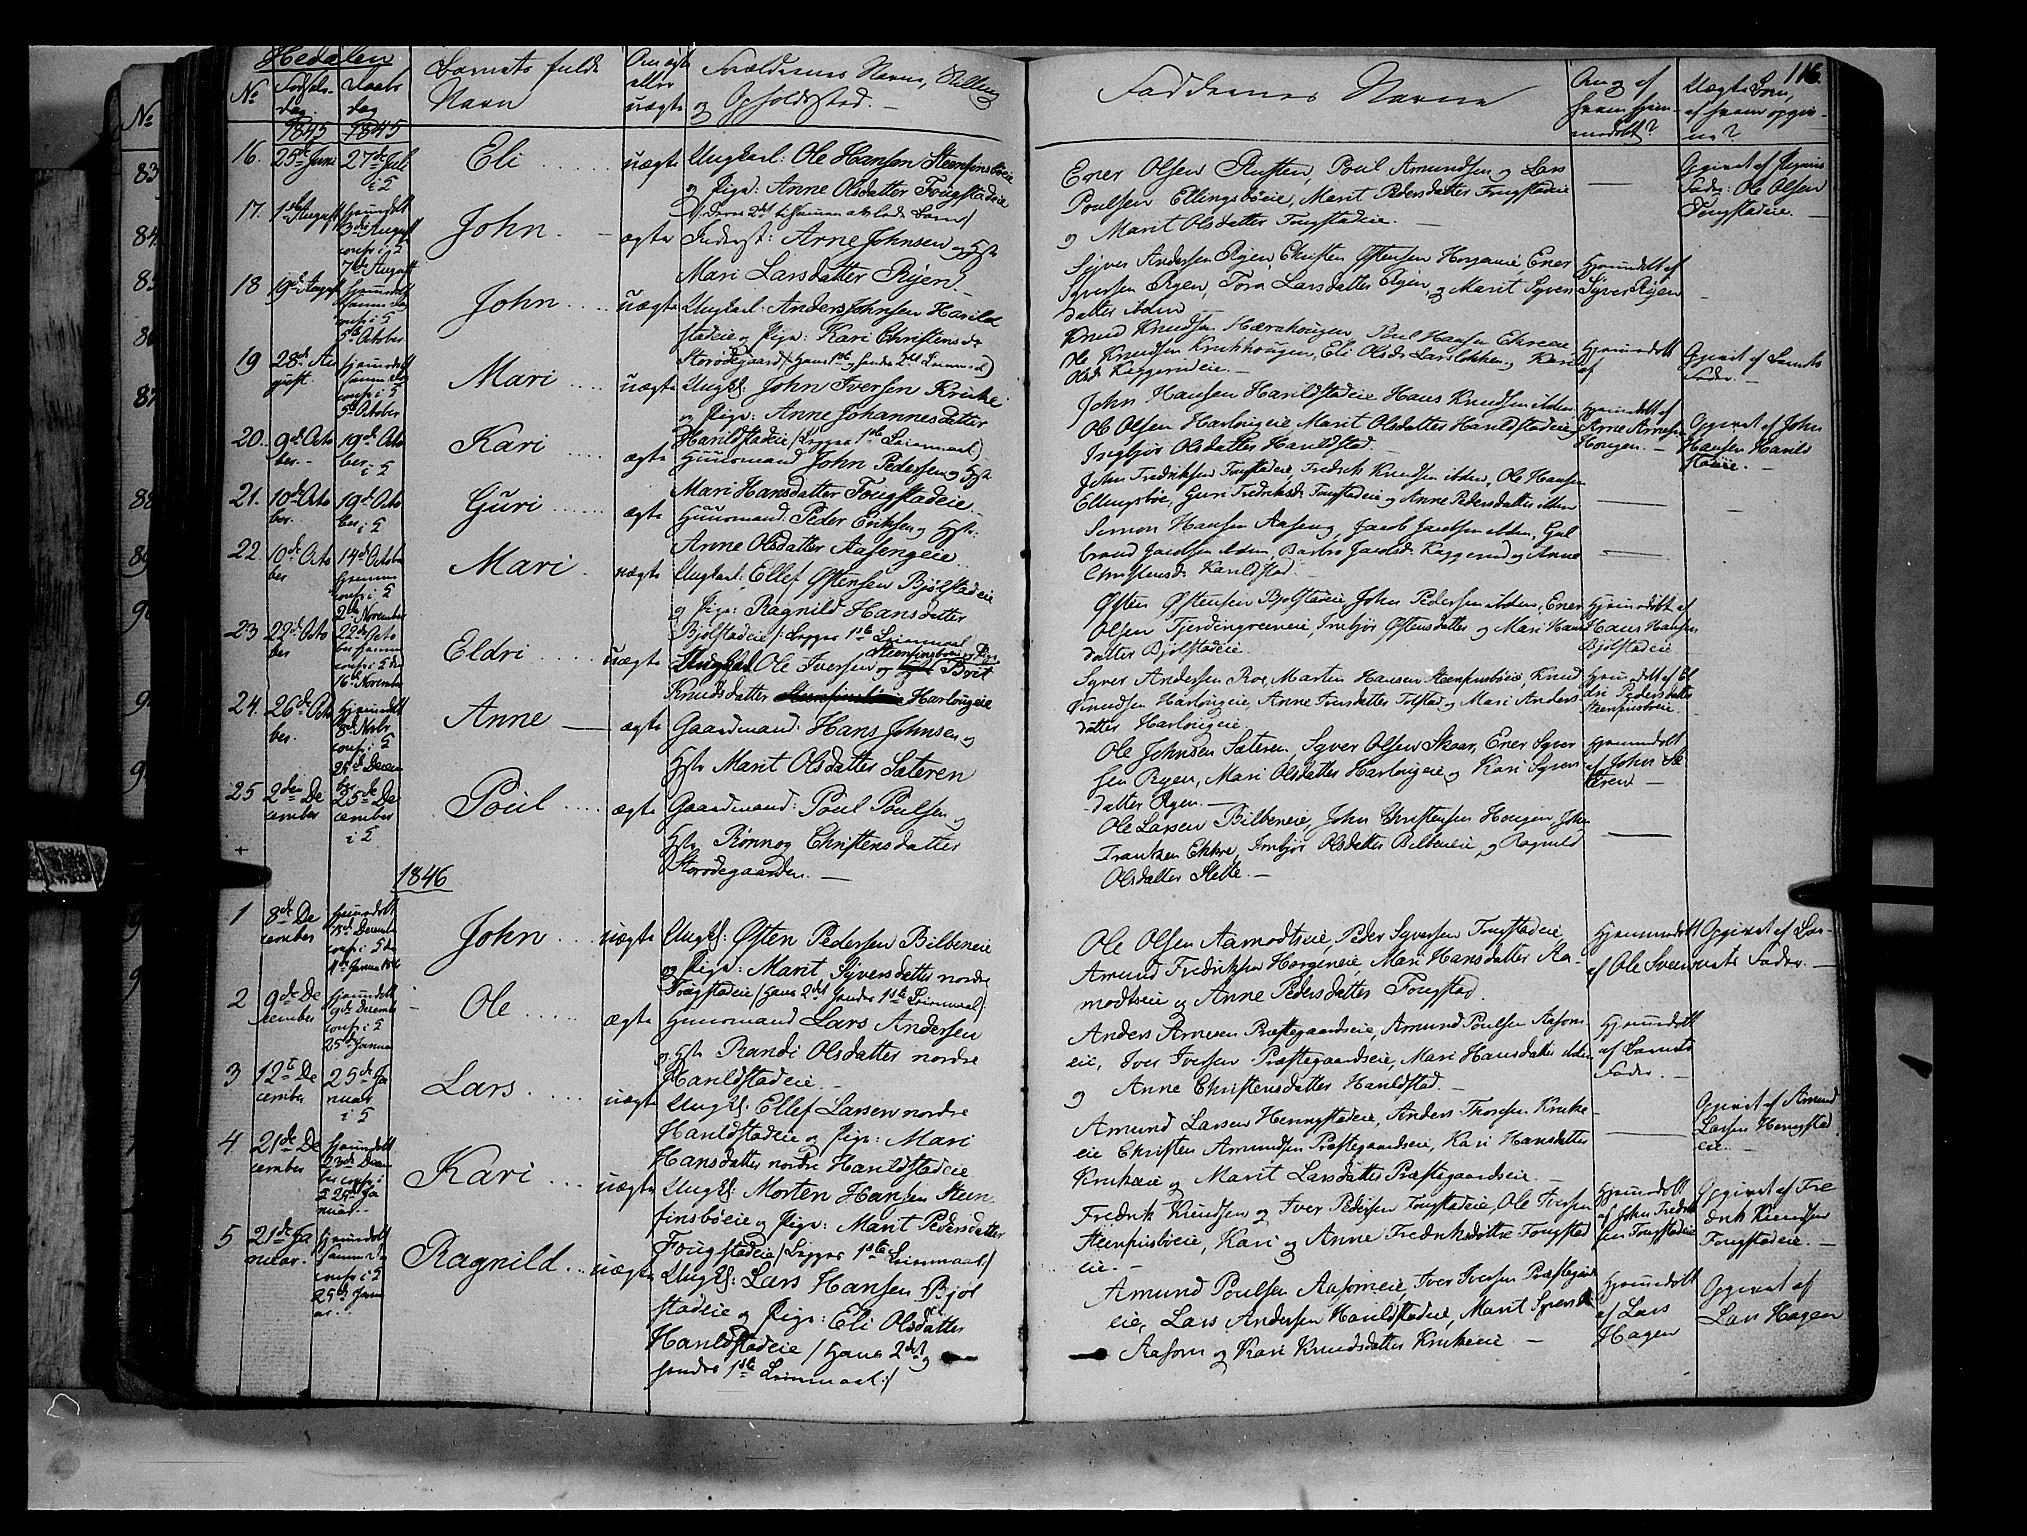 SAH, Vågå prestekontor, Ministerialbok nr. 5 /2, 1842-1856, s. 116